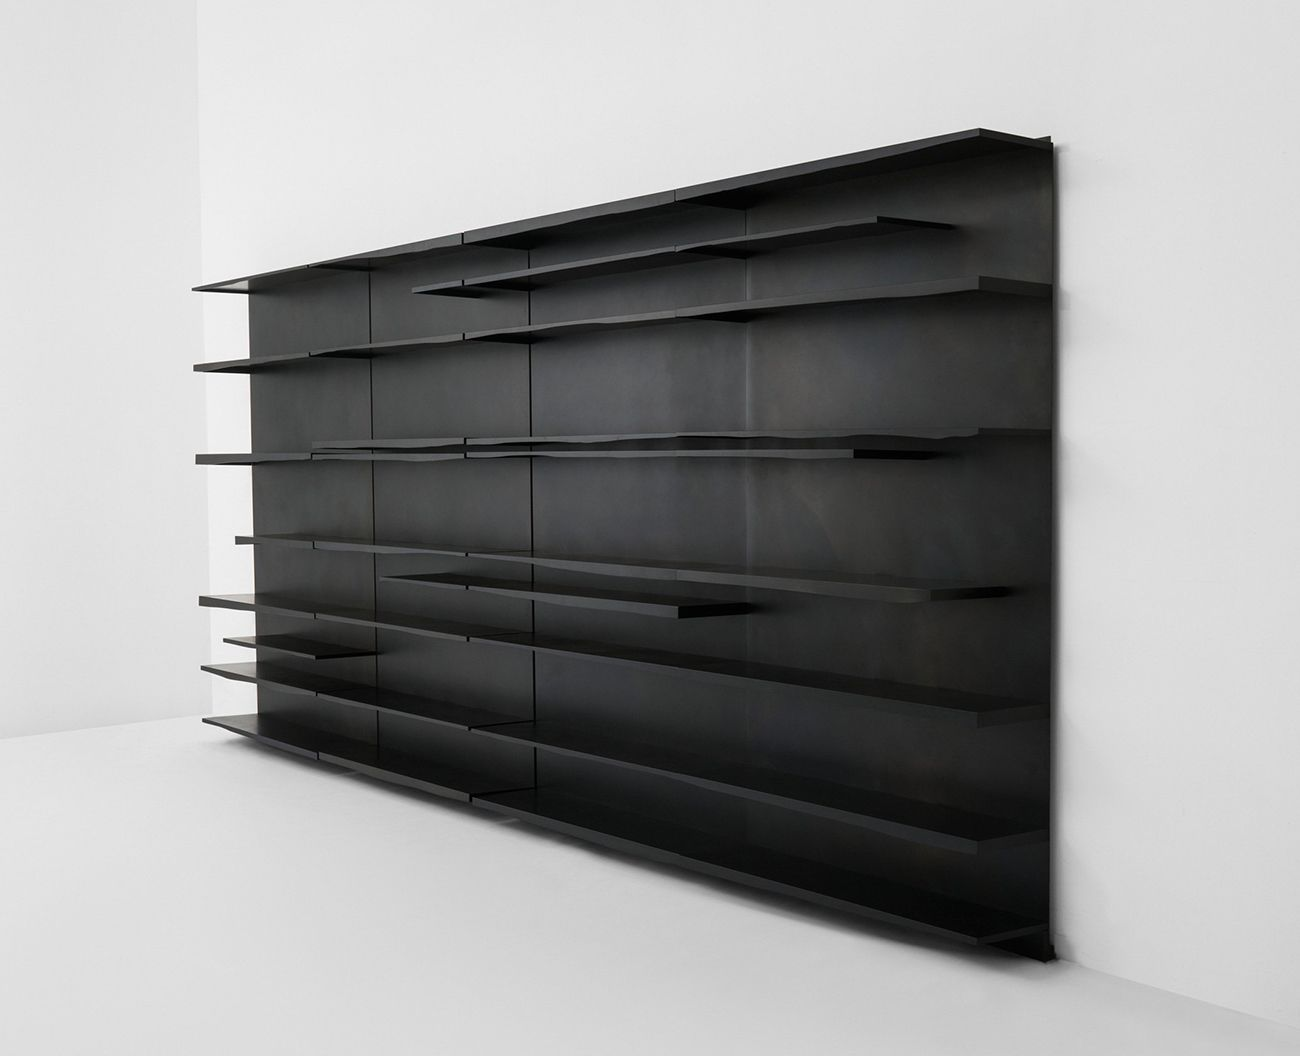 fredrikson-stallard-scriptus-shelving-collective-design_dezeen